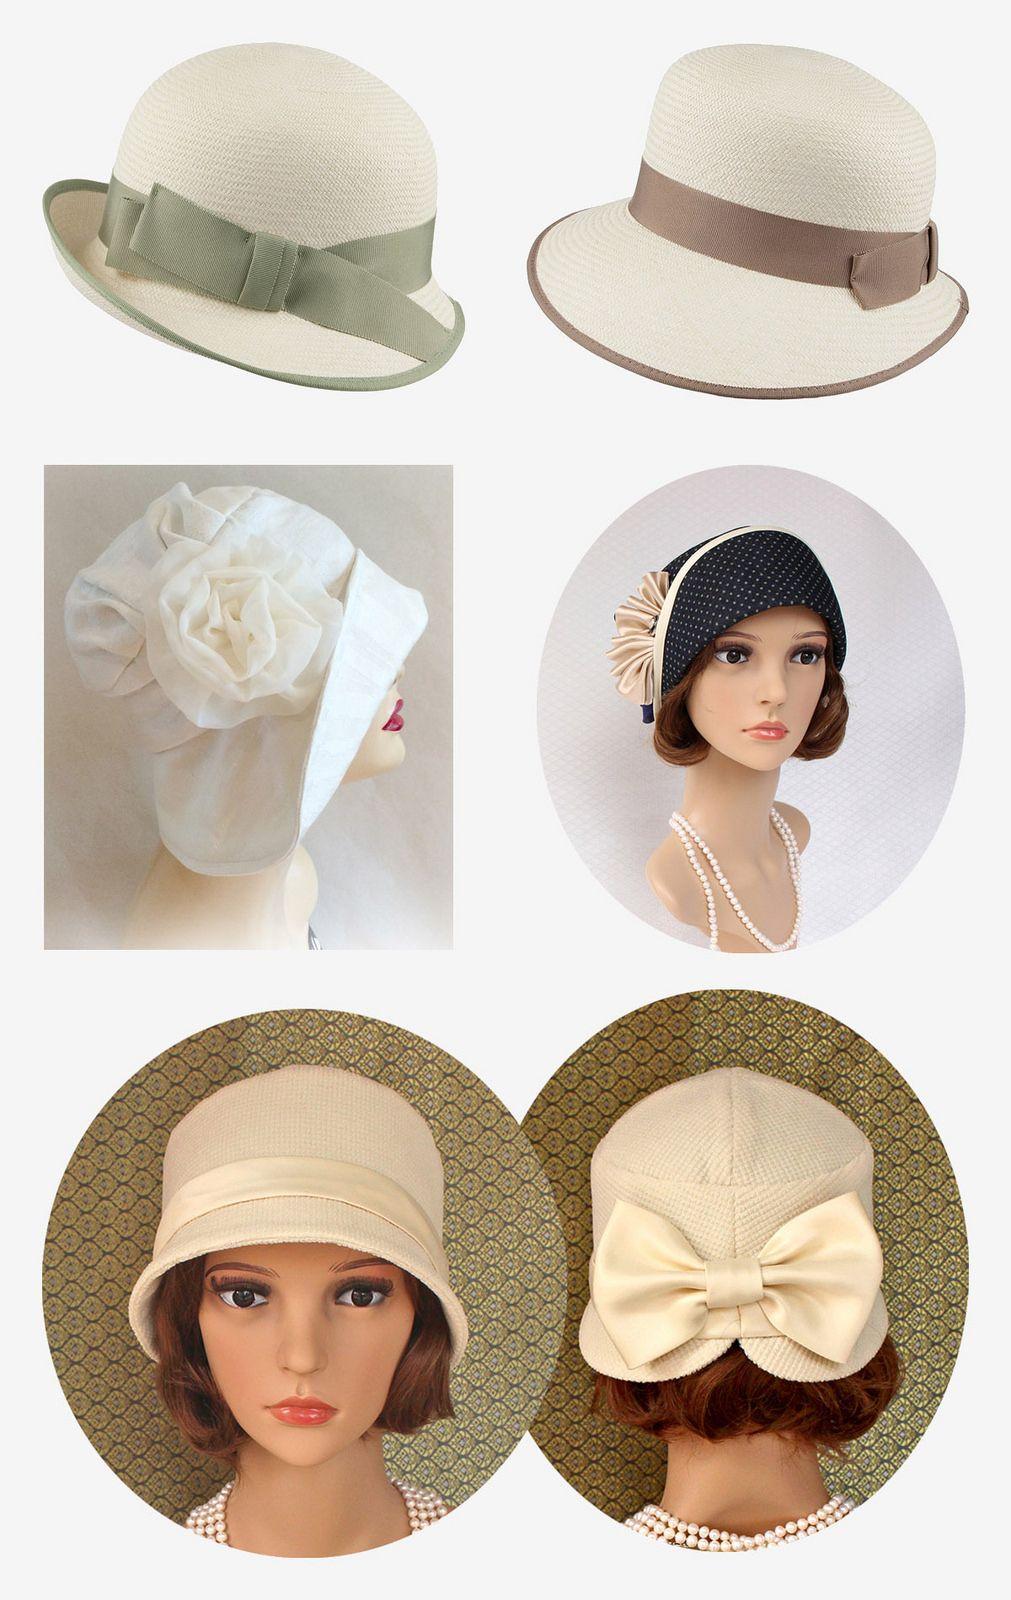 34 Modern Wedding Guest Hats and Fascinators - Cloche hats  da71d63616d